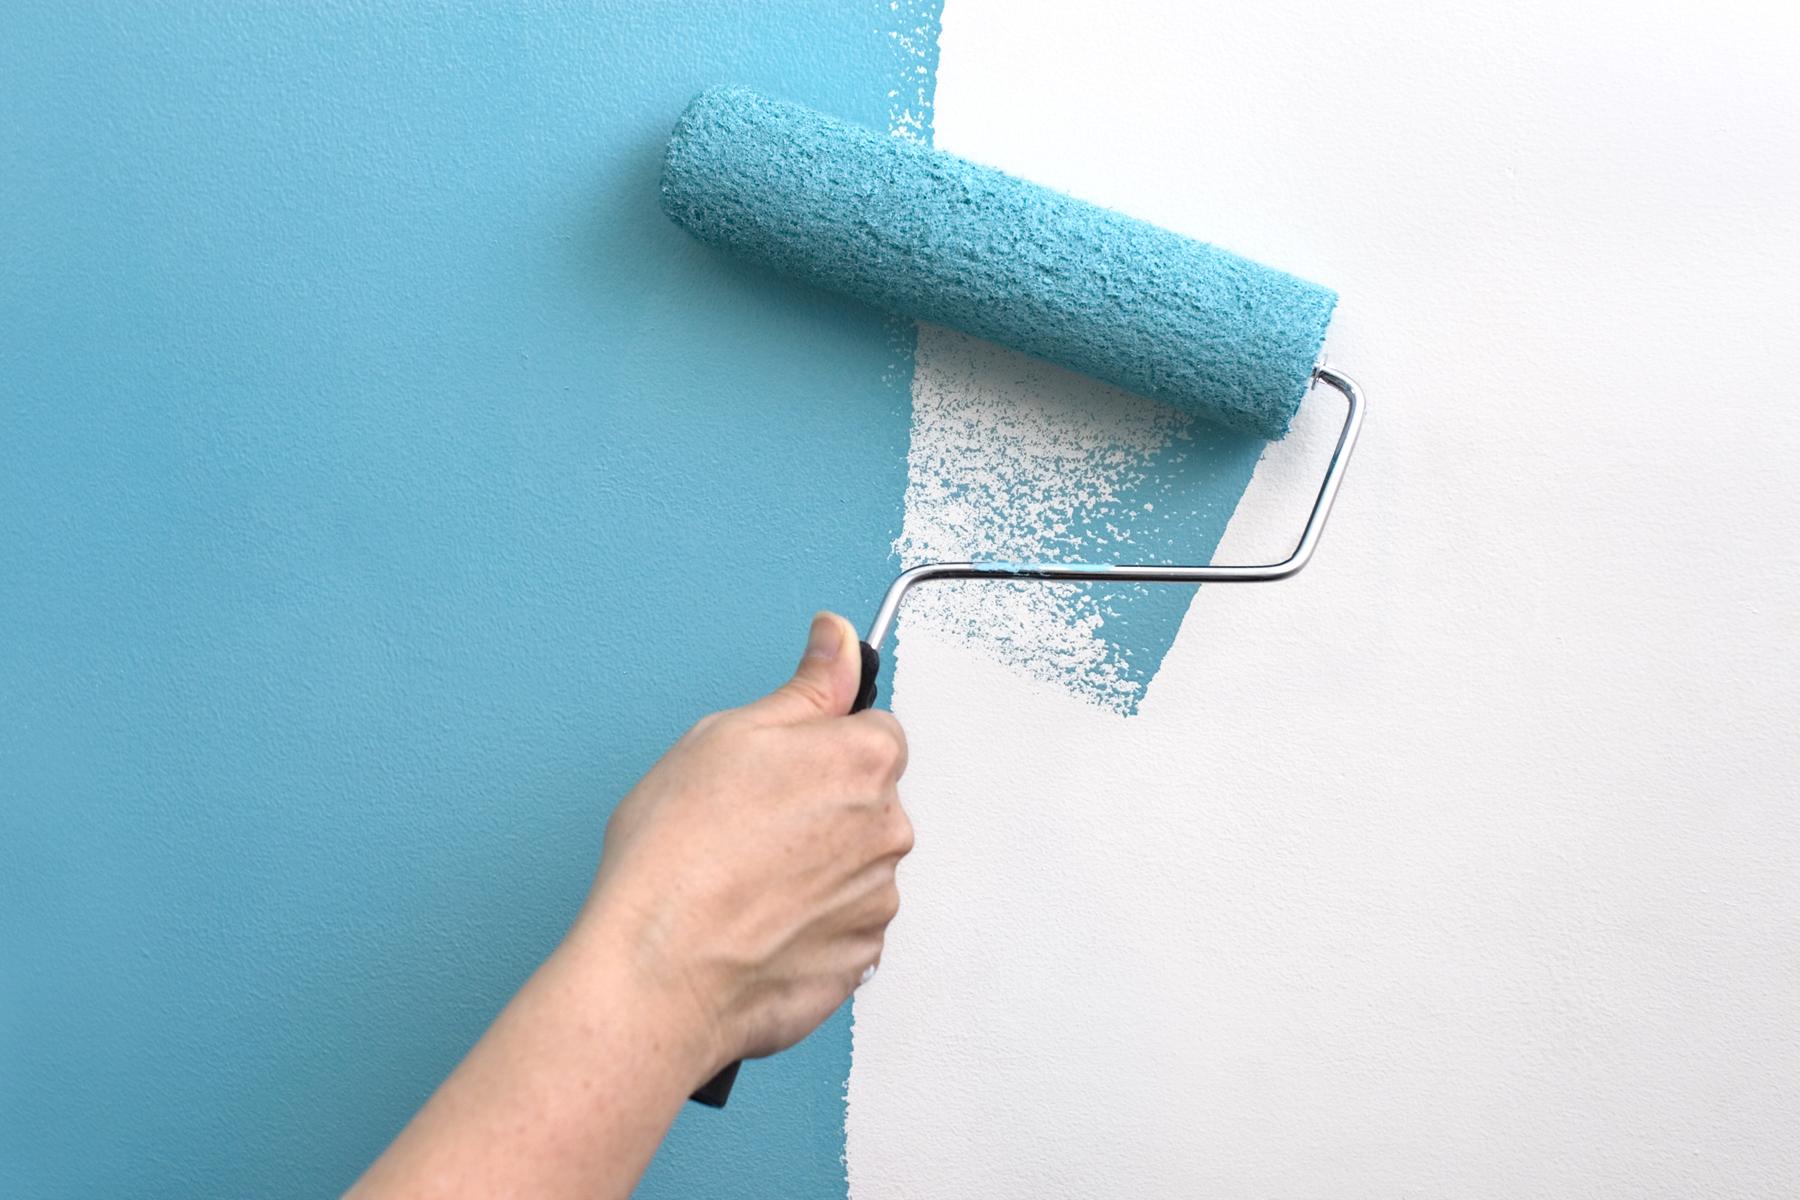 окрашивание стен синей краской